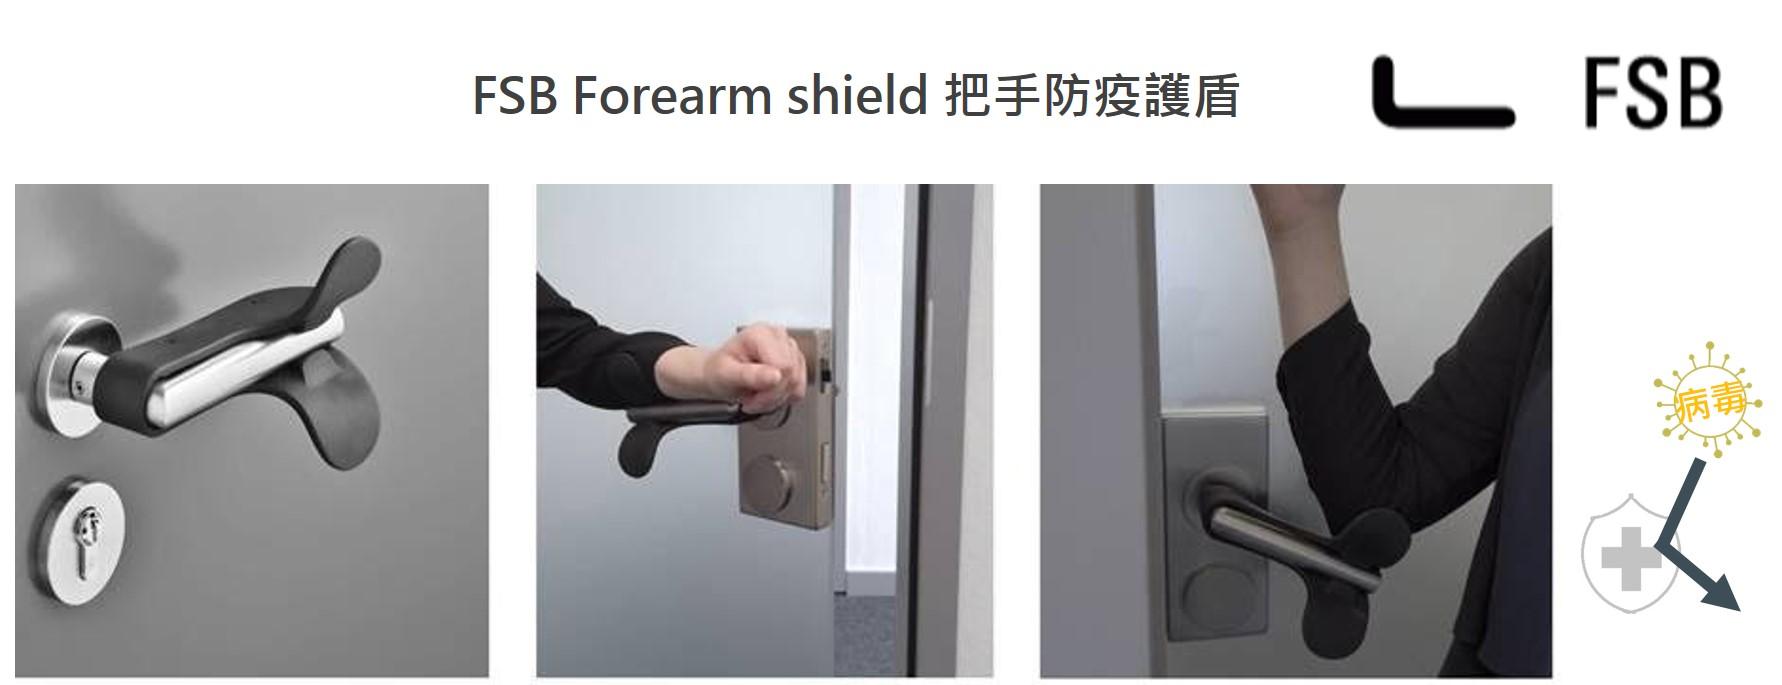 FSB_防疫把手配件